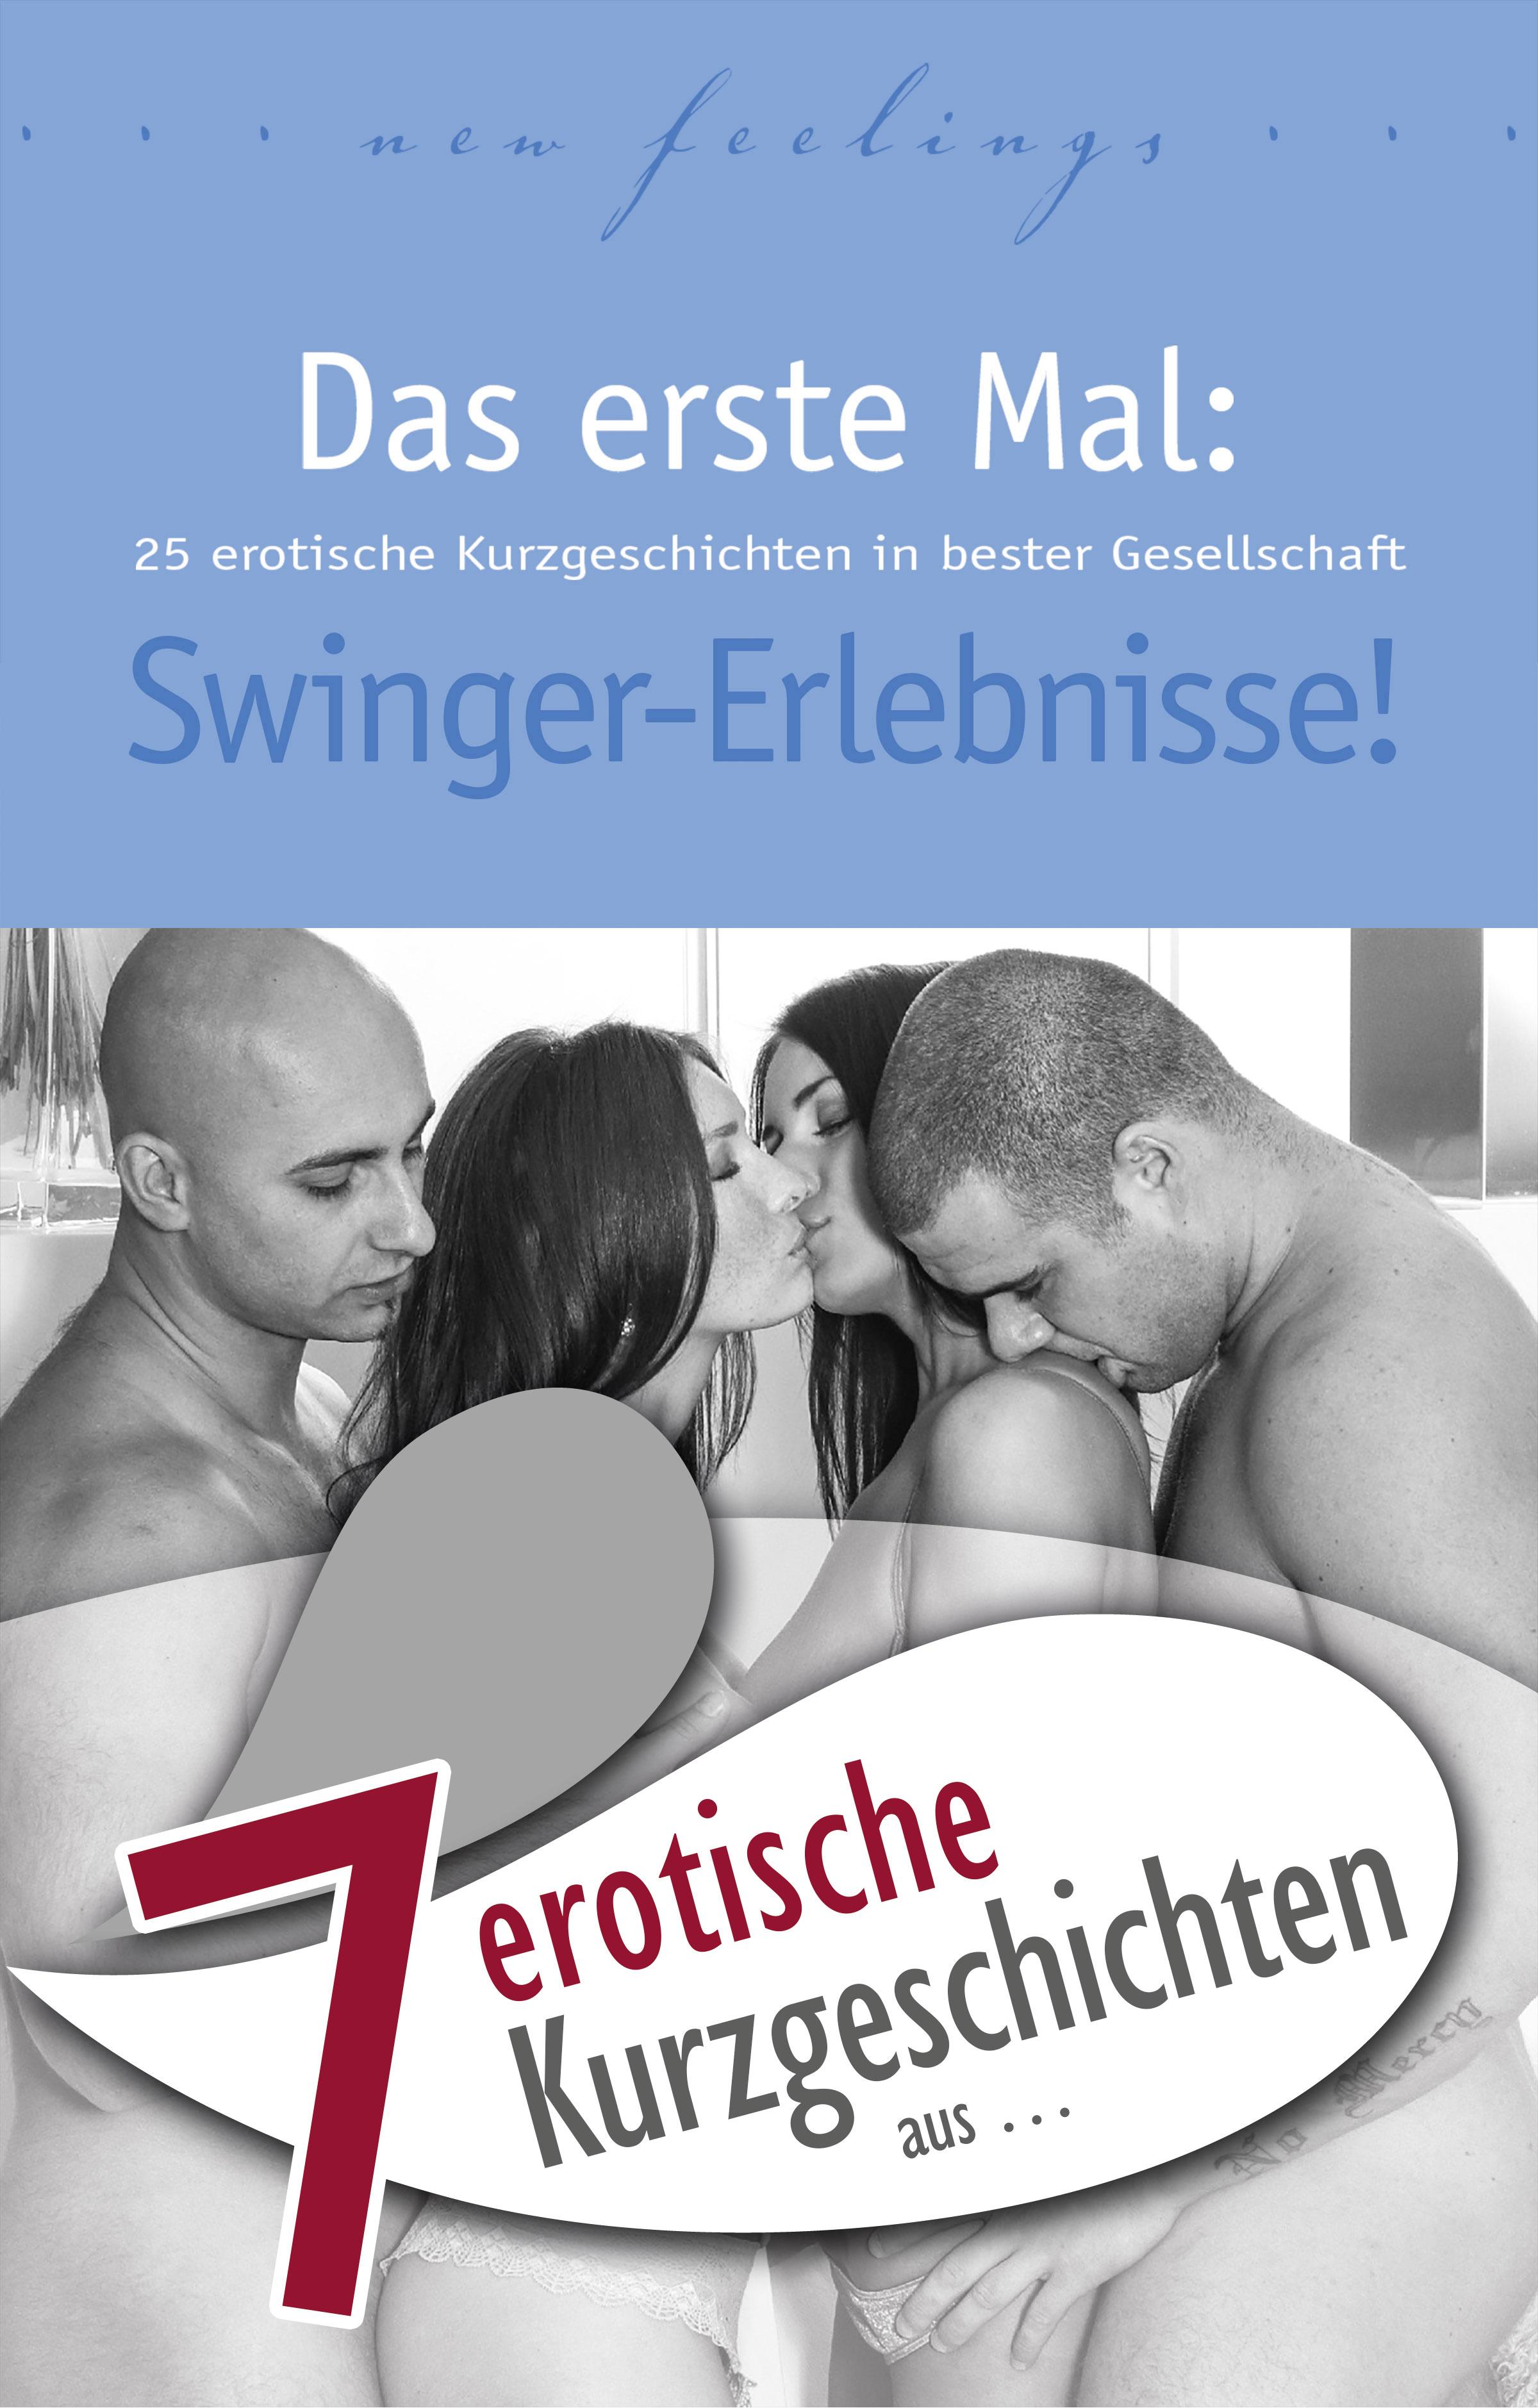 Diane Bertini 7 erotische Kurzgeschichten aus: Das erste Mal: Swinger-Erlebnisse! bertini bertini 6 c 1016 20 cr